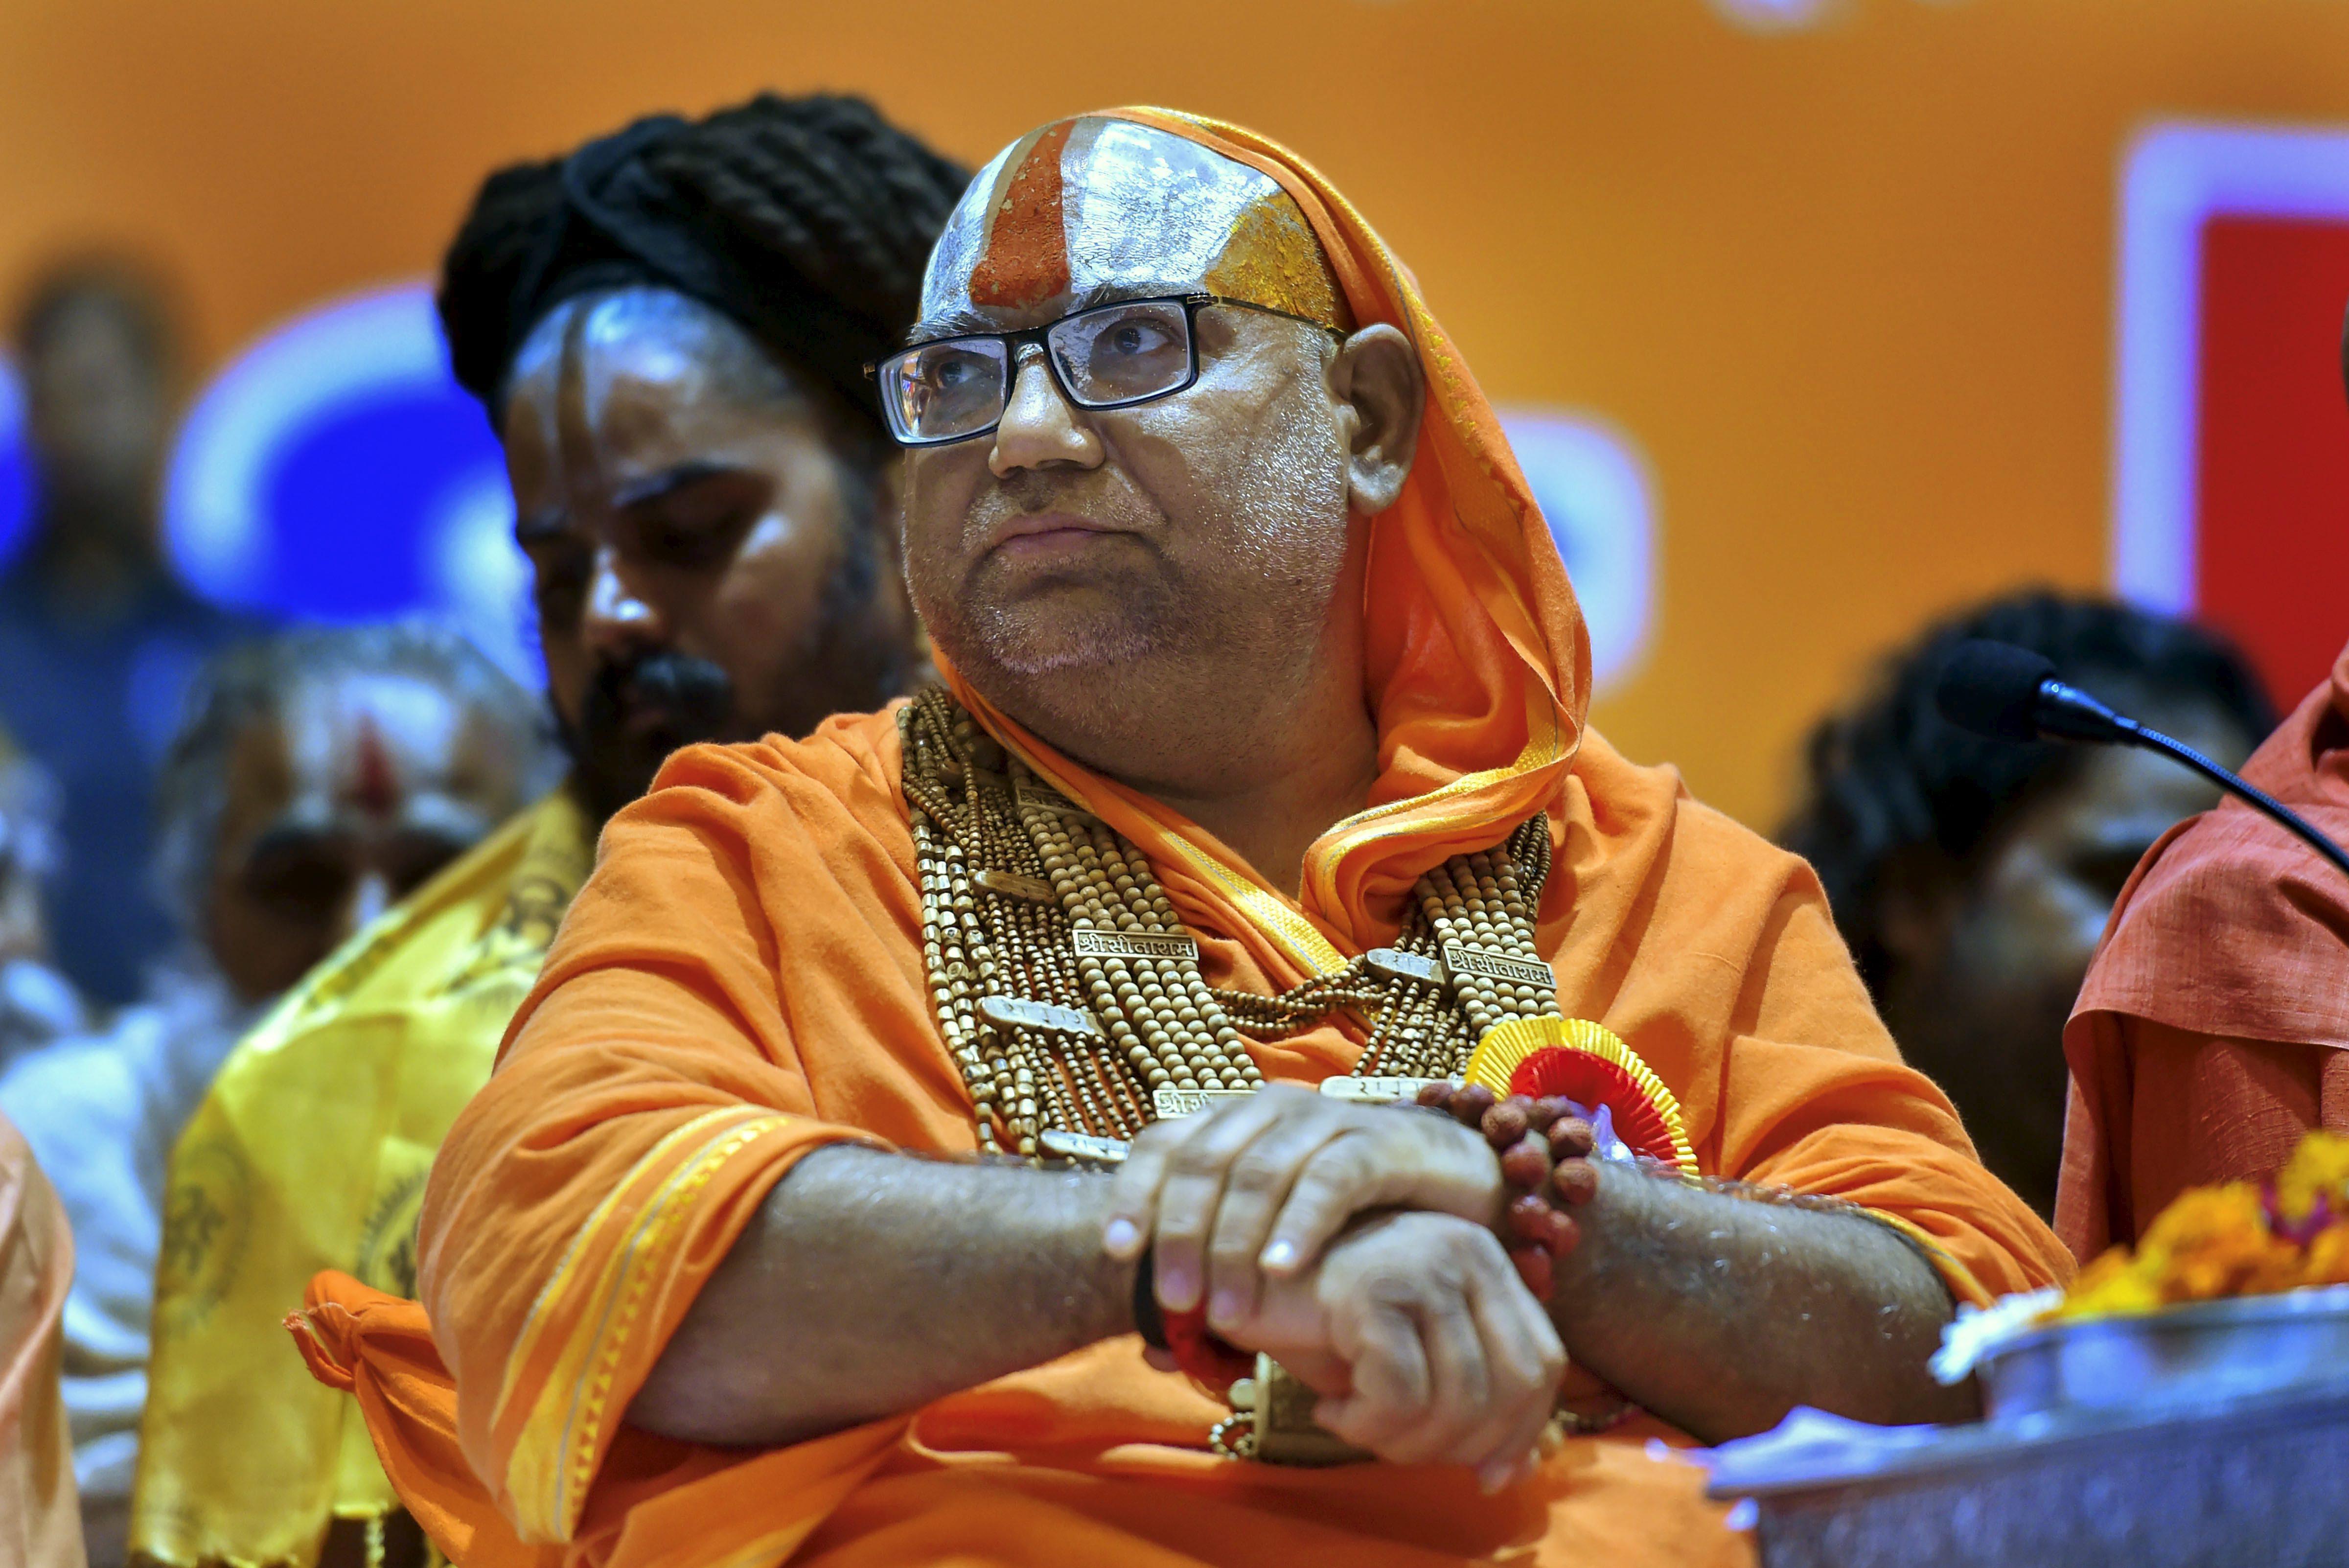 Akhil Bharatiya Sant Samiti chief Jagadguru Hansdevacharya at the two-day 'Dharmadesh' meeting of the Hindu seers, at Talkatora Stadium, in New Delhi, on Sunday. PTI